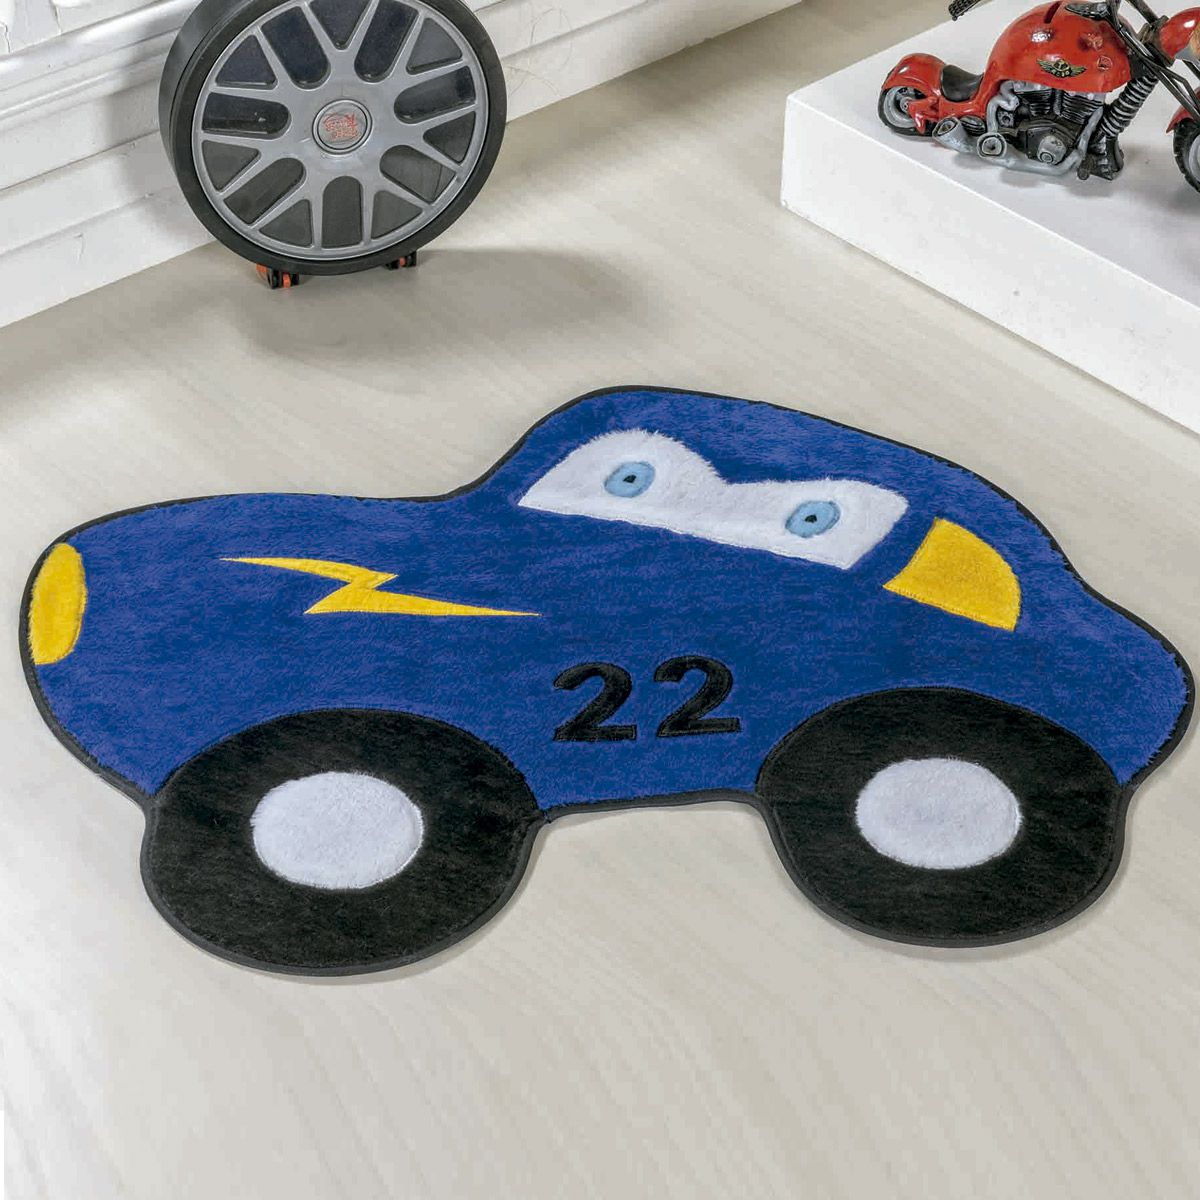 Tapete Big Infantil Premium Formato Carrinho 22 Azul Royal 1,18m x 0,88m